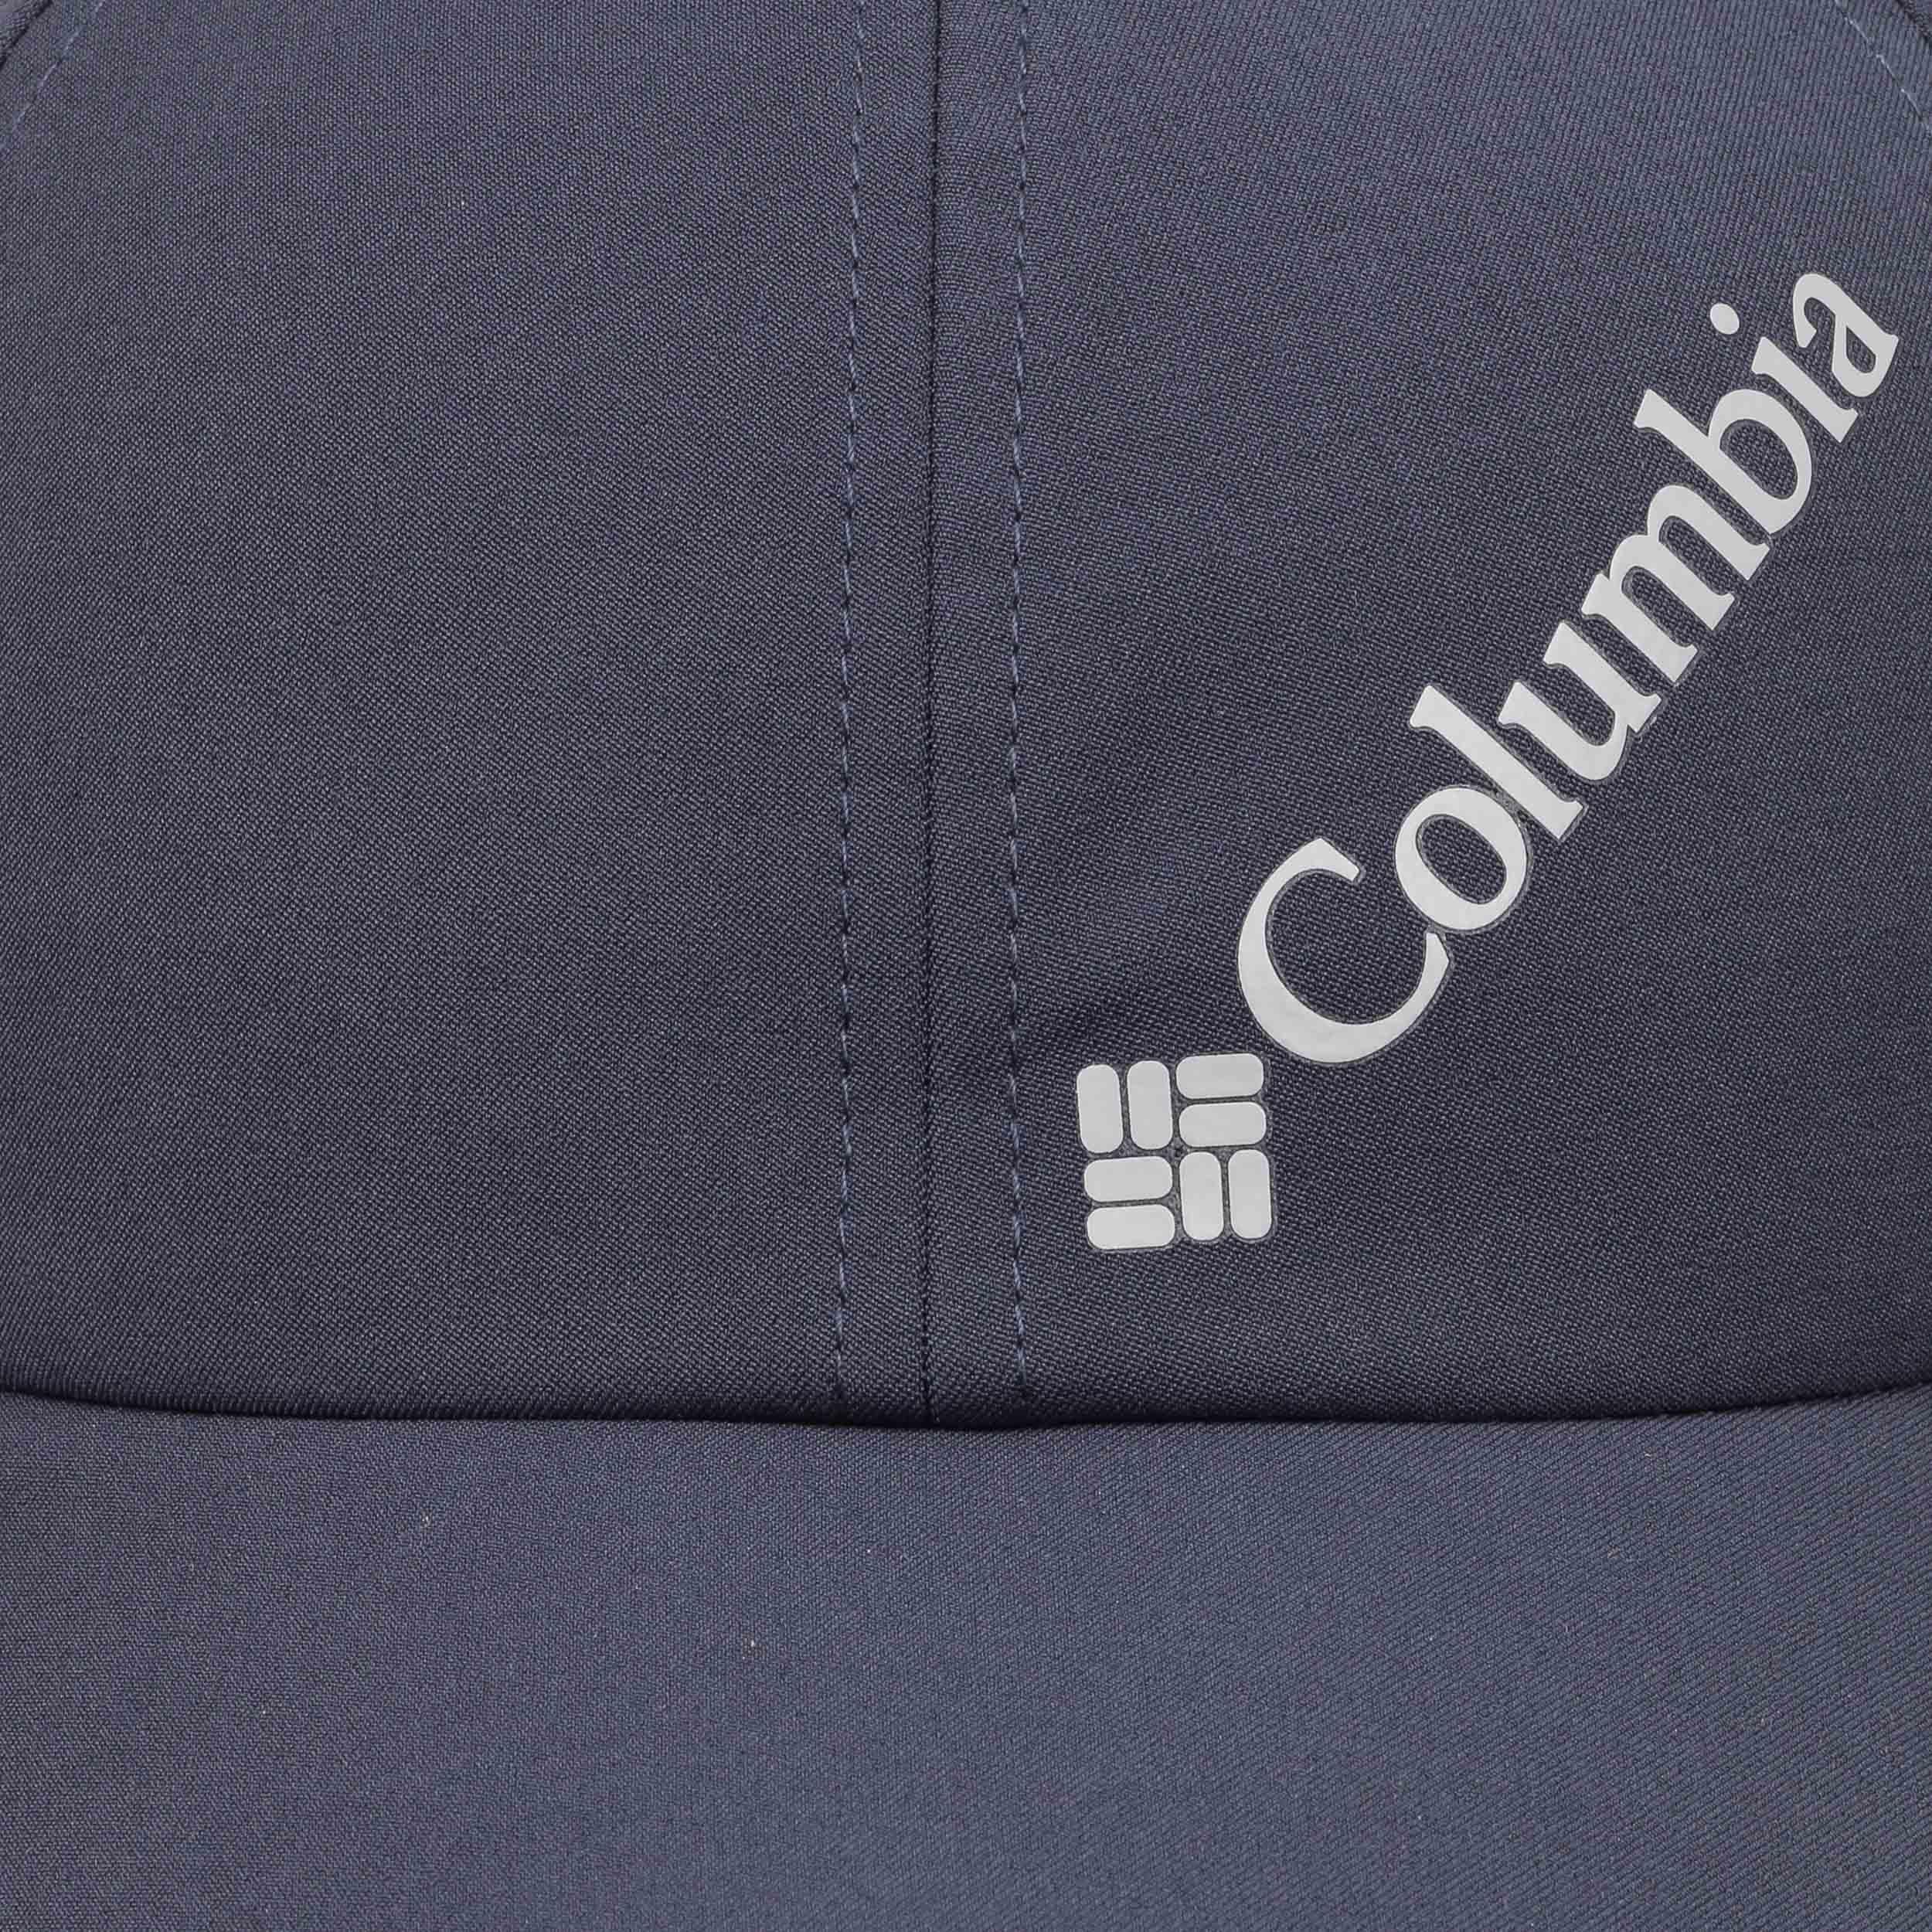 628a54a071 ... Silver Ridge Women´s Cap by Columbia - blue 4 ...